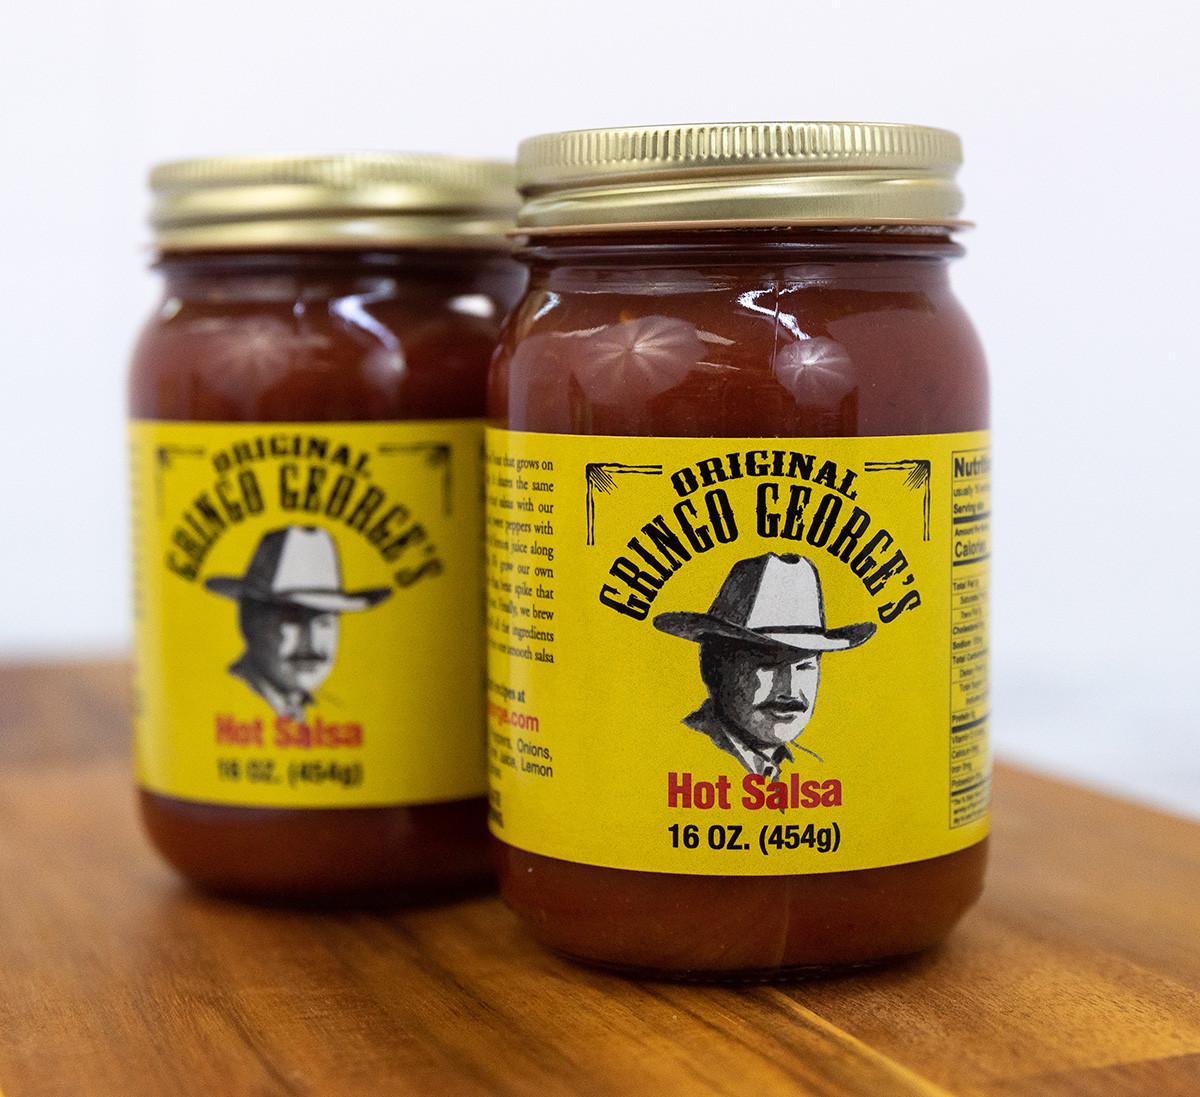 Gringo George's Hot Salsa